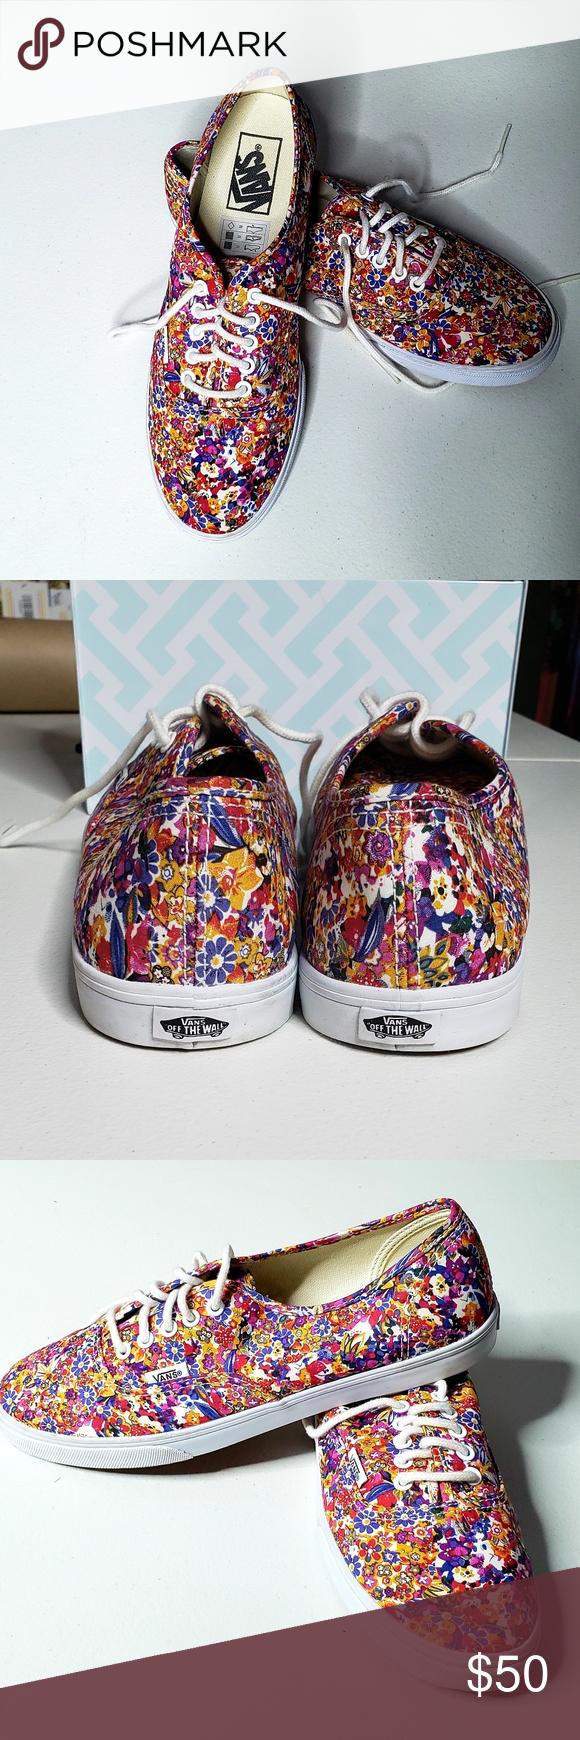 3f8db8c8748a NEW! Floral VANS Beautiful floral Van s. Never worn. Size 8.5 S-103 Vans  Shoes Sneakers